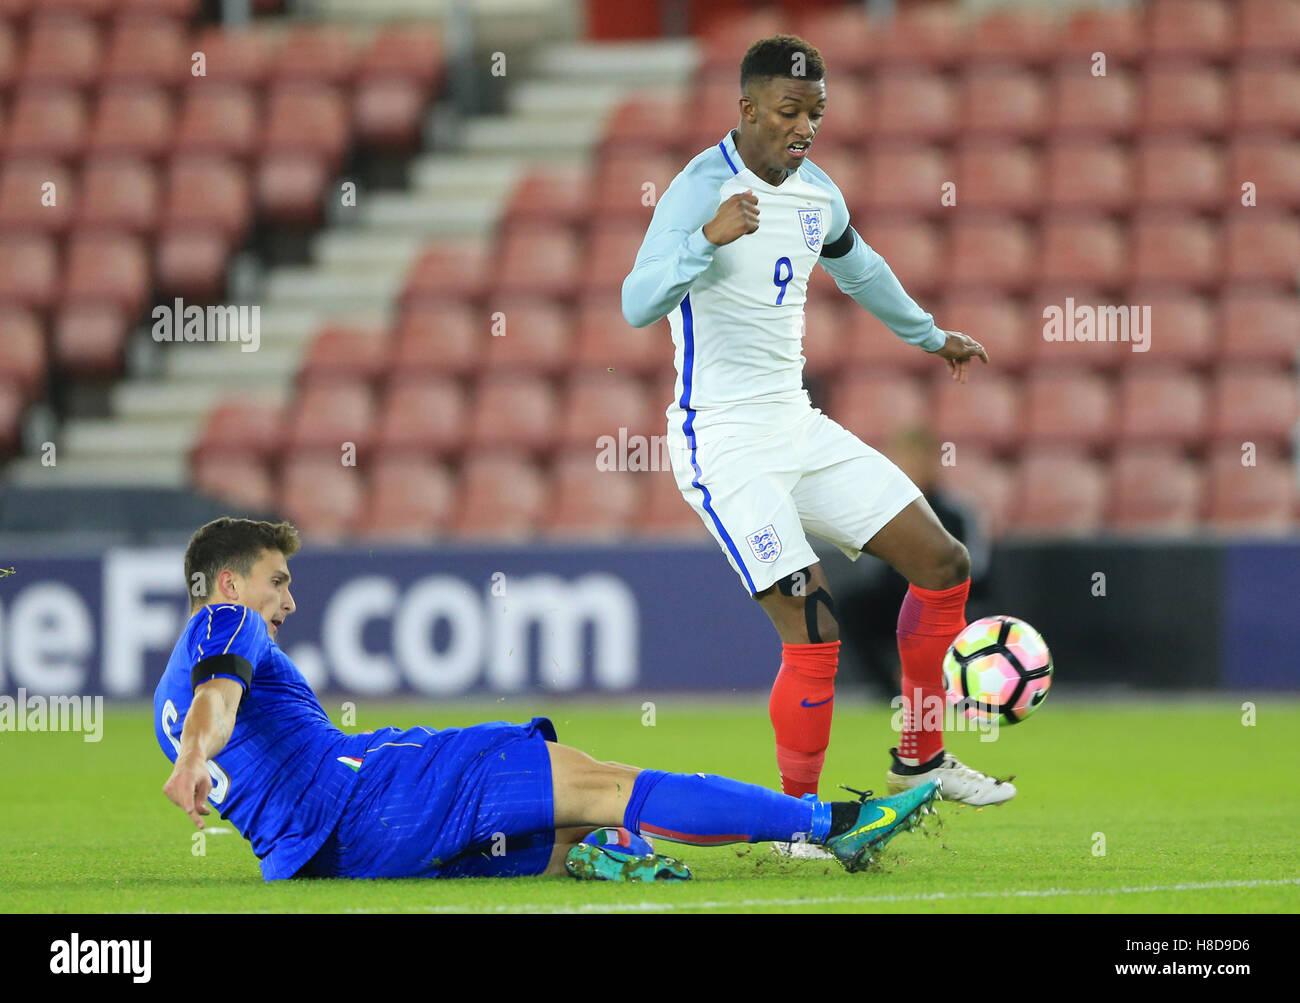 England U21's Demarai Gray (right) is tackled by Italy U21's Mattia Caldara during the International Friendly - Stock Image